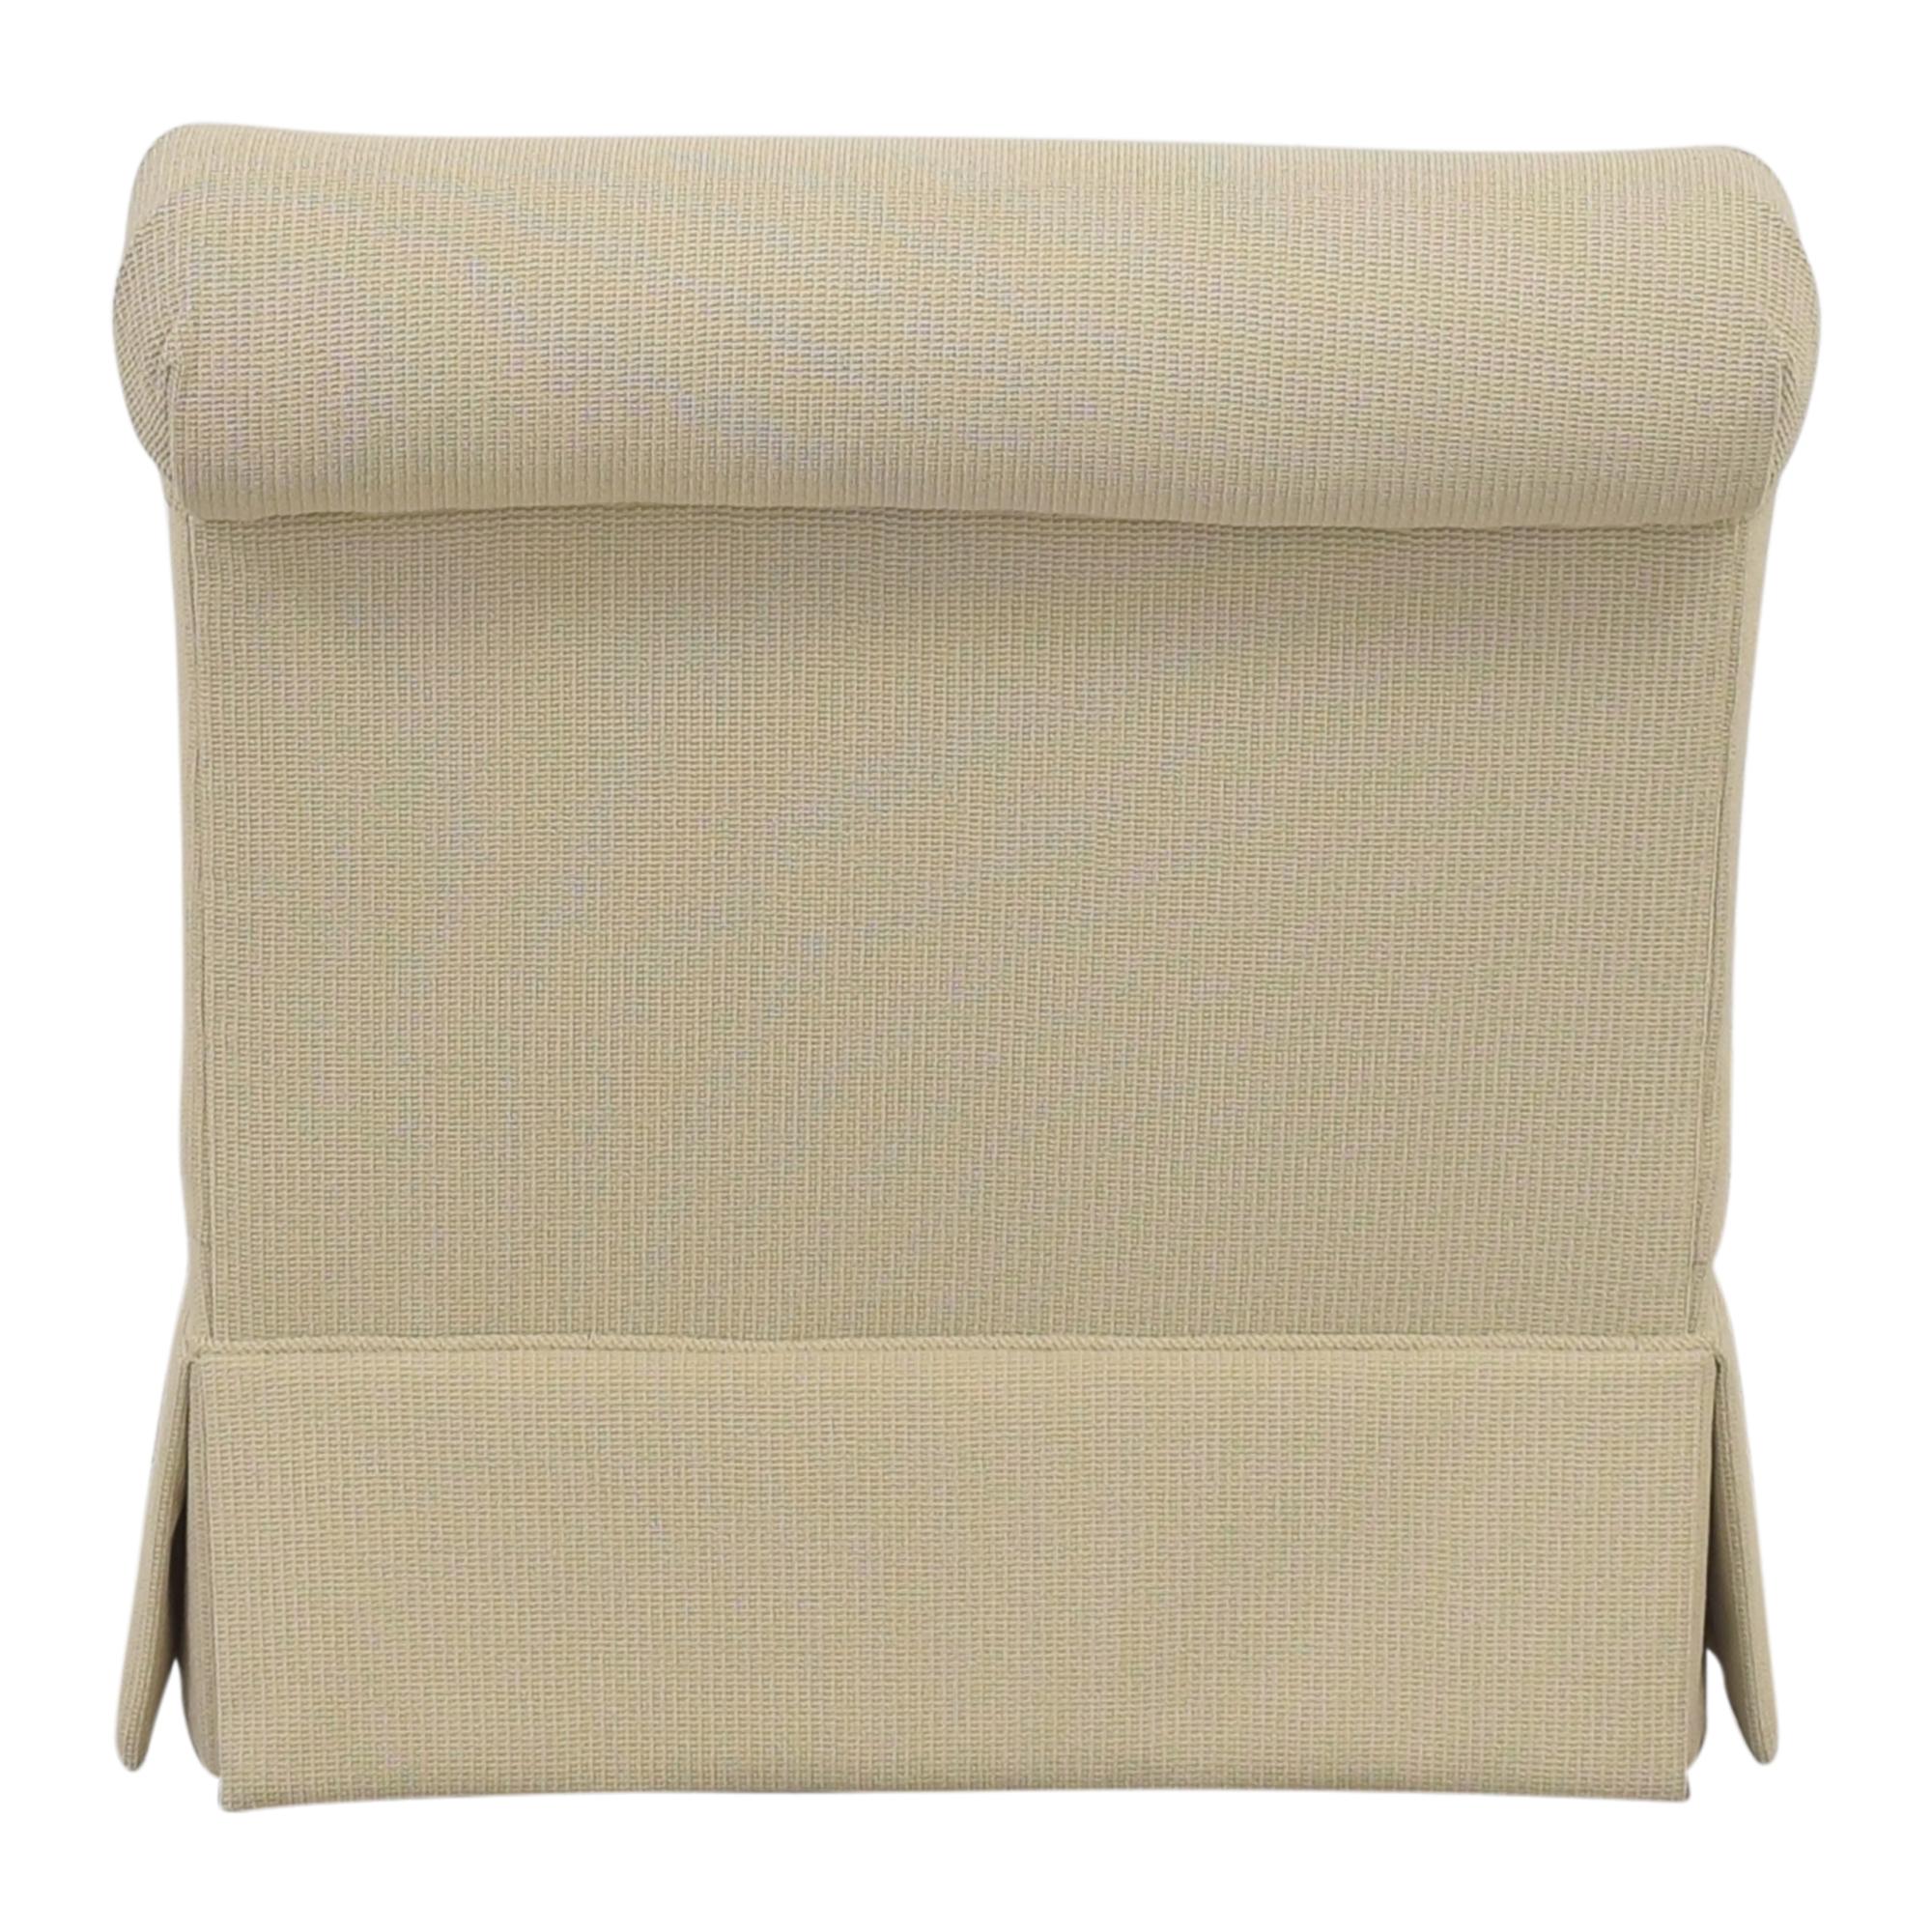 Hickory Chair Slipper Chair sale